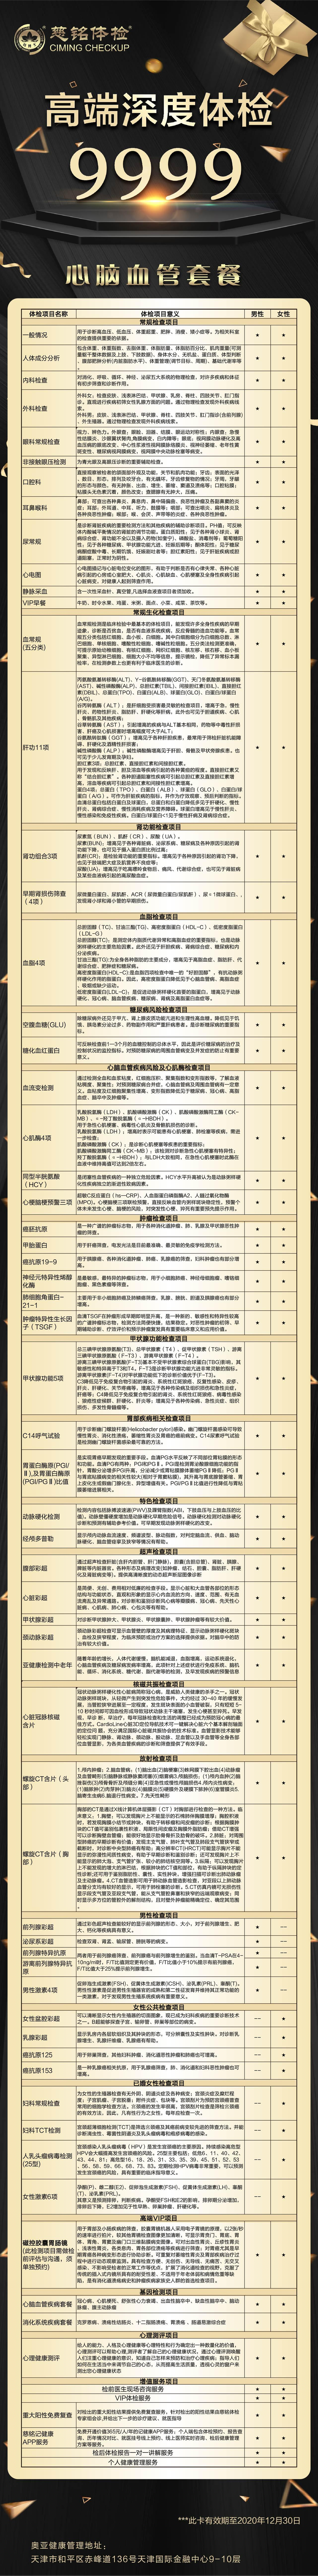 aoya-9999心血管套餐